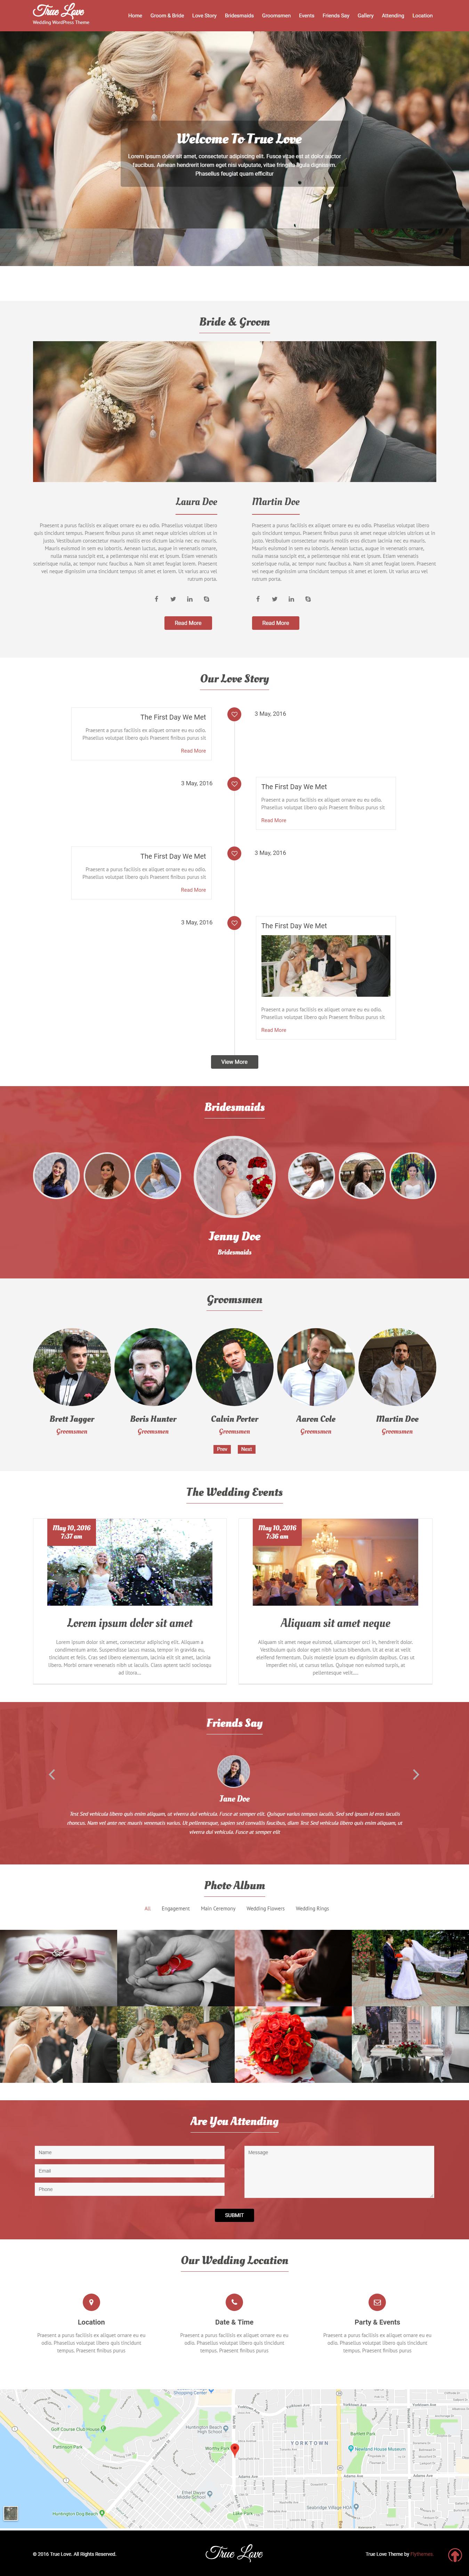 true love best free wedding wordpress theme - 10+ Best Free Wedding WordPress Themes